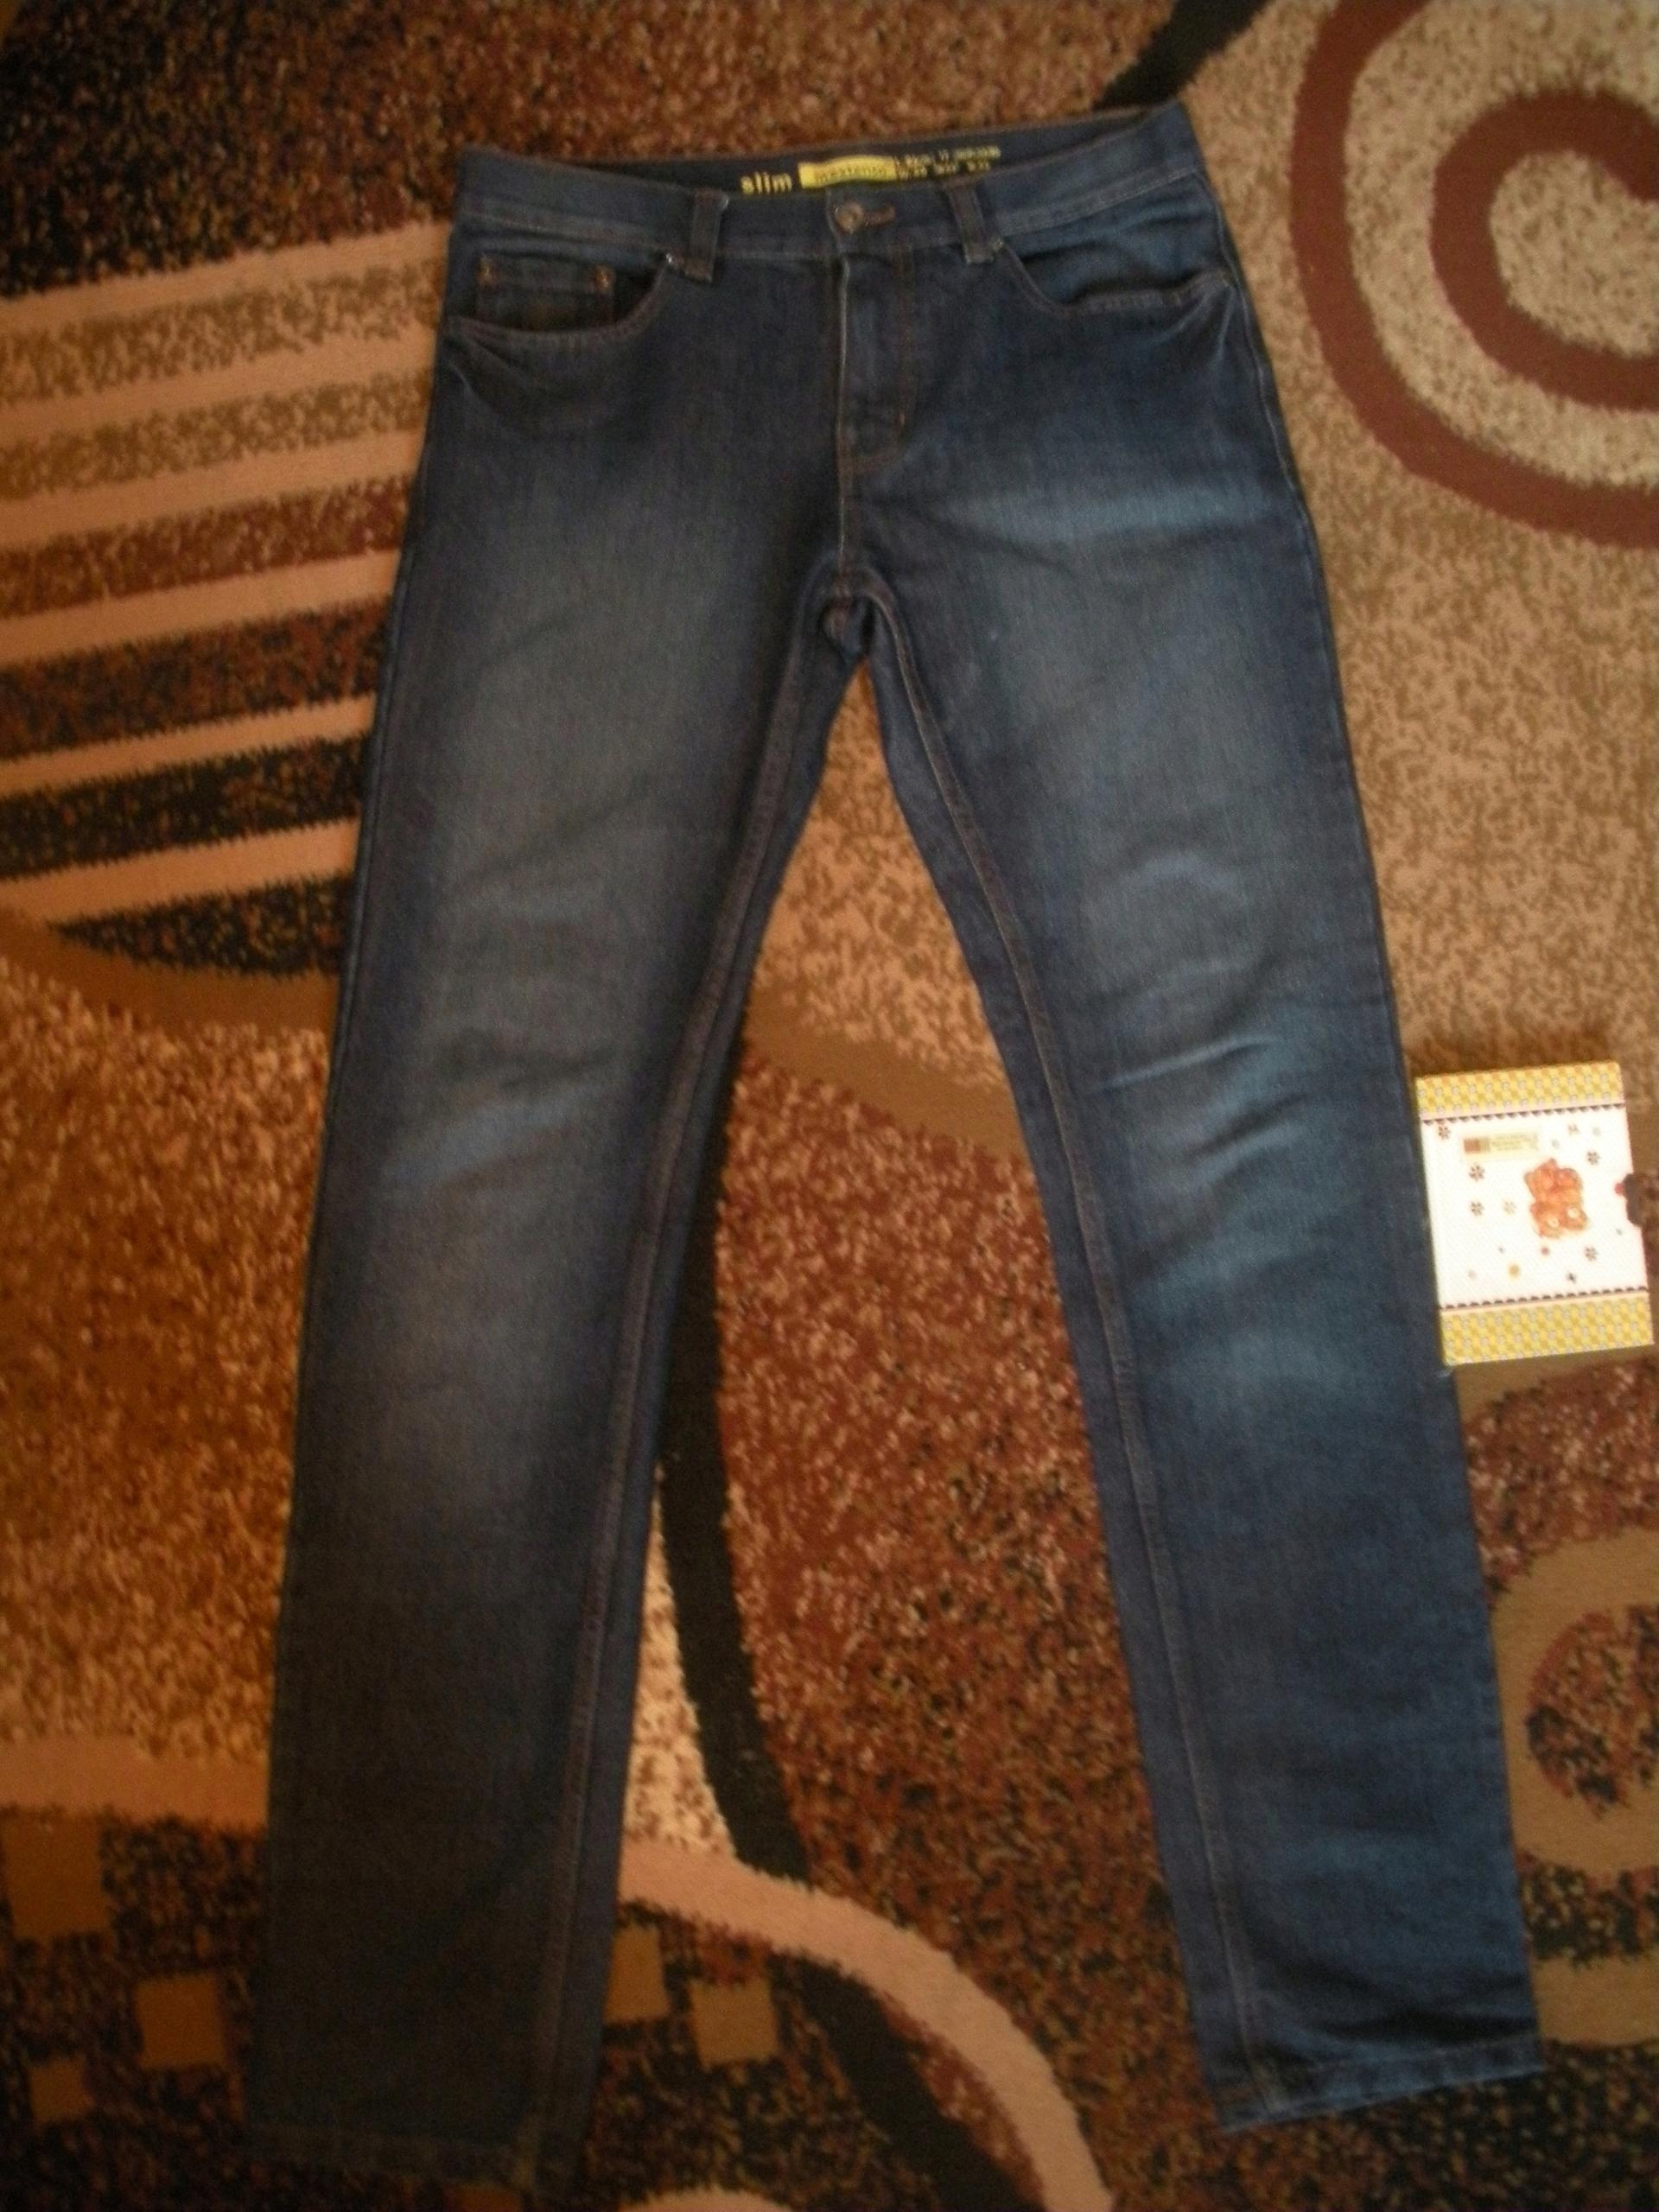 136ecd15ac6a3 Spodnie Jeans In Extenso L Rozmiar 7510099860 q6qRHS